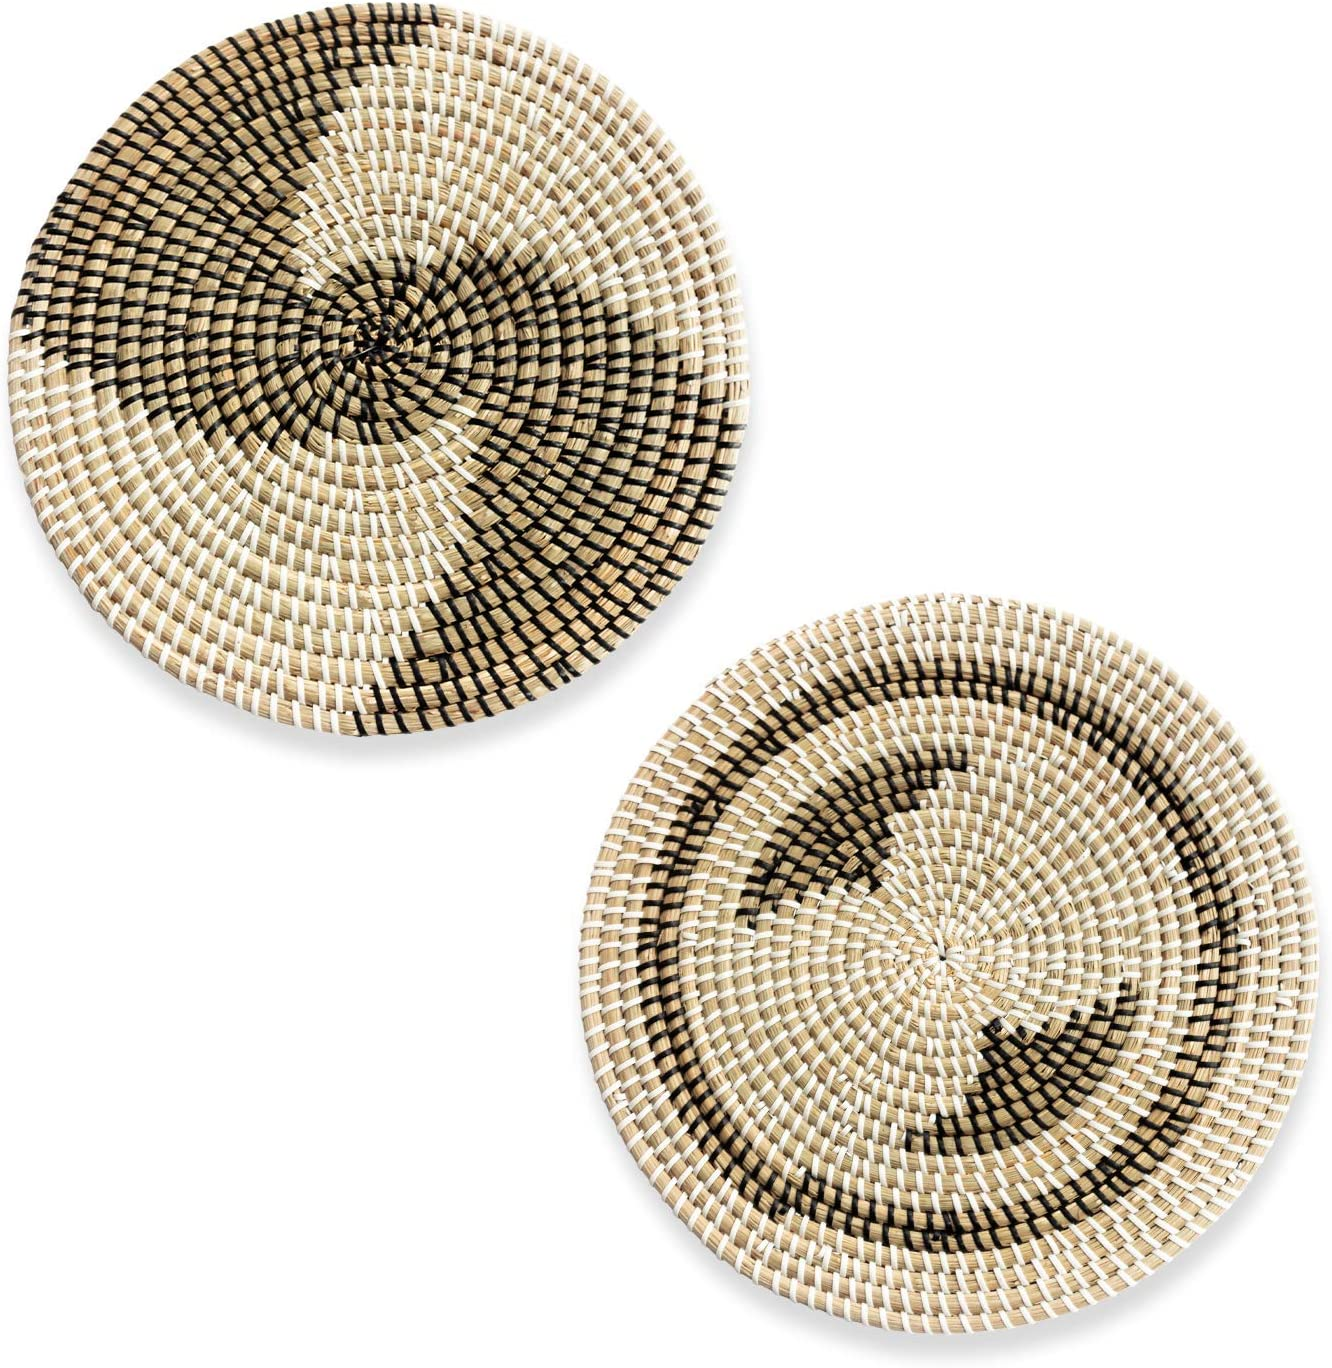 "HNCmua Decorative Flat Basket for Wall - Decorative Chargers - Flat Wicker Basket for Wall 11.7"" - Decorative Baskets for Wall - Woven Plates for Wall - 2 Piece Set"